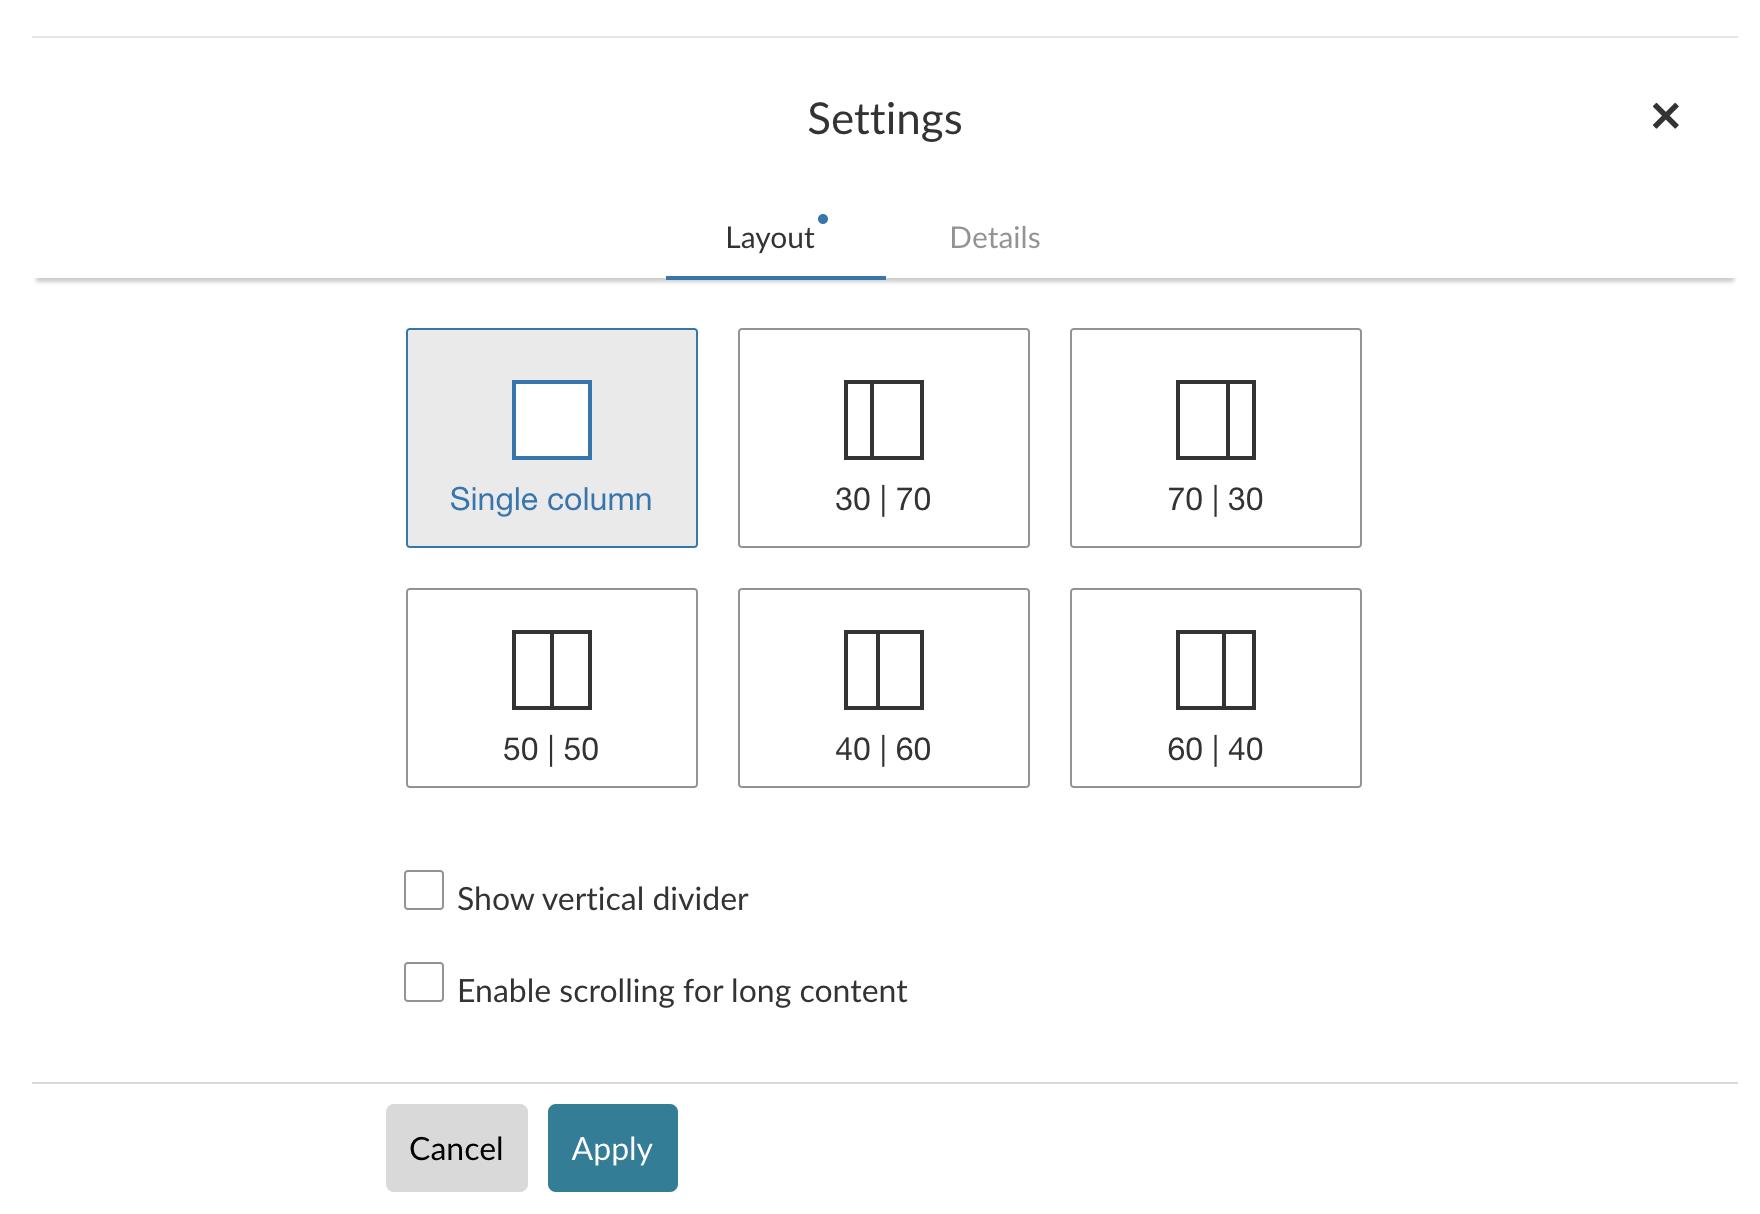 The layout settings modal screen